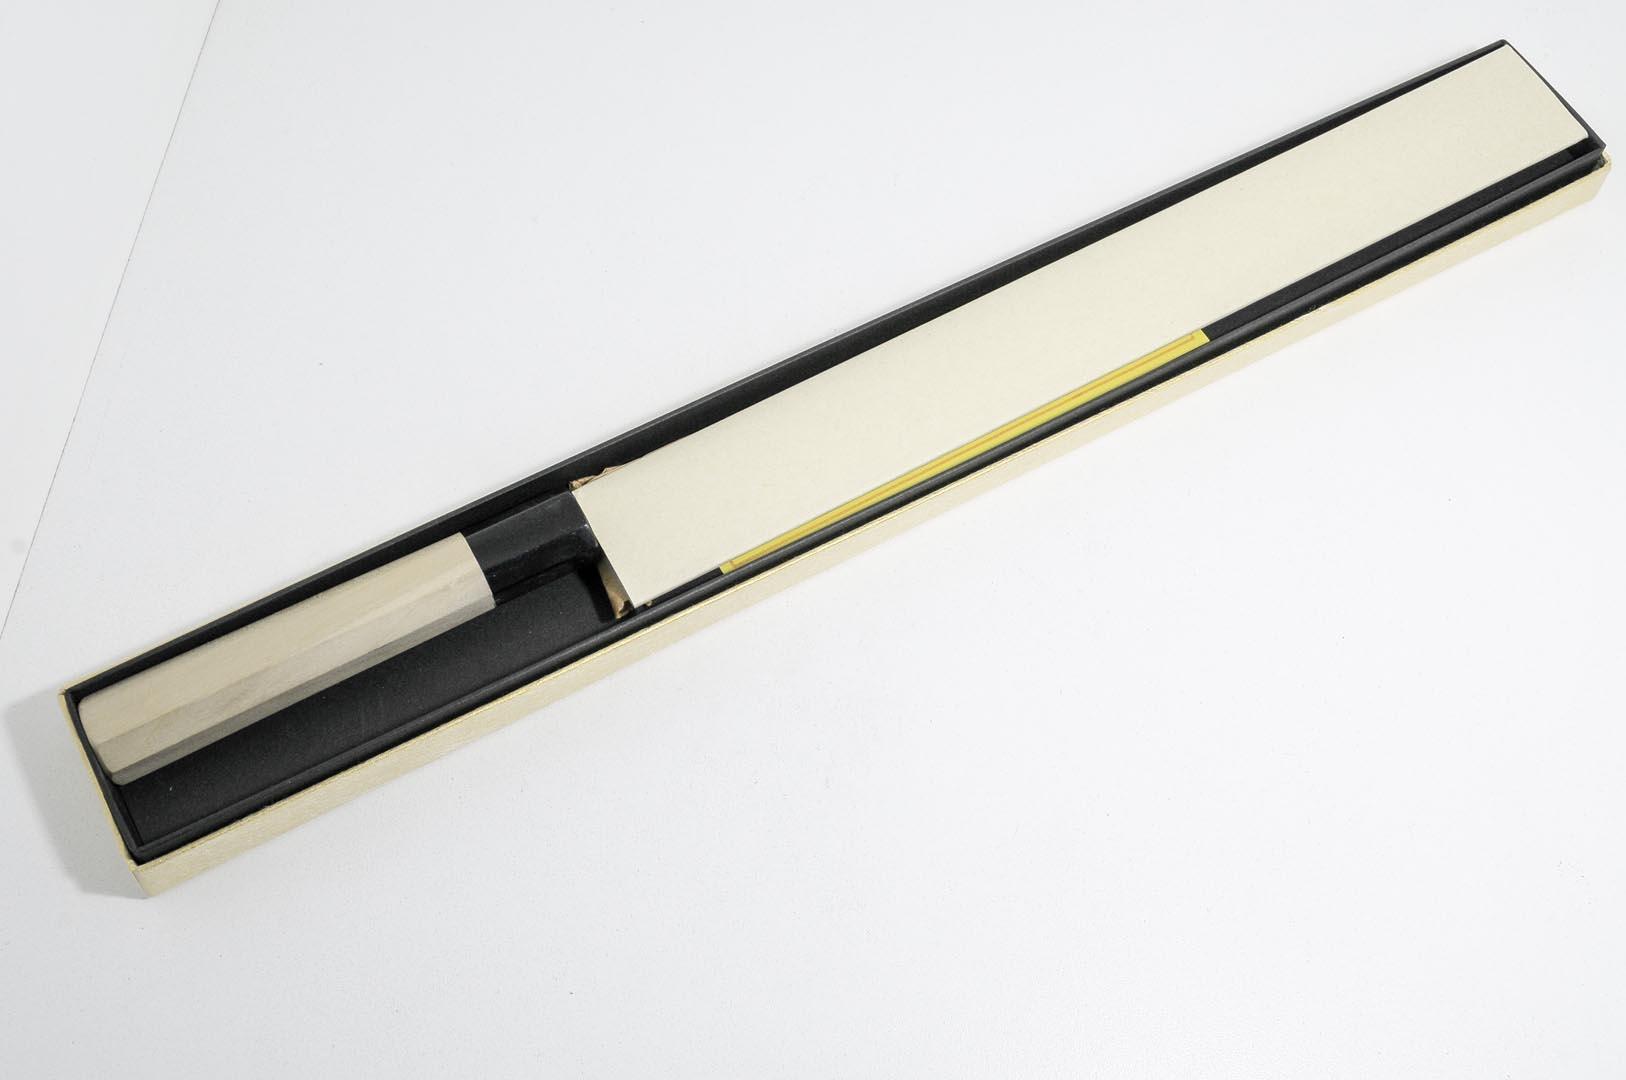 y33w1-Cuchillo Yanagi 33cm acero Shirogami #1 Yoshihiro y33w1-max-6.